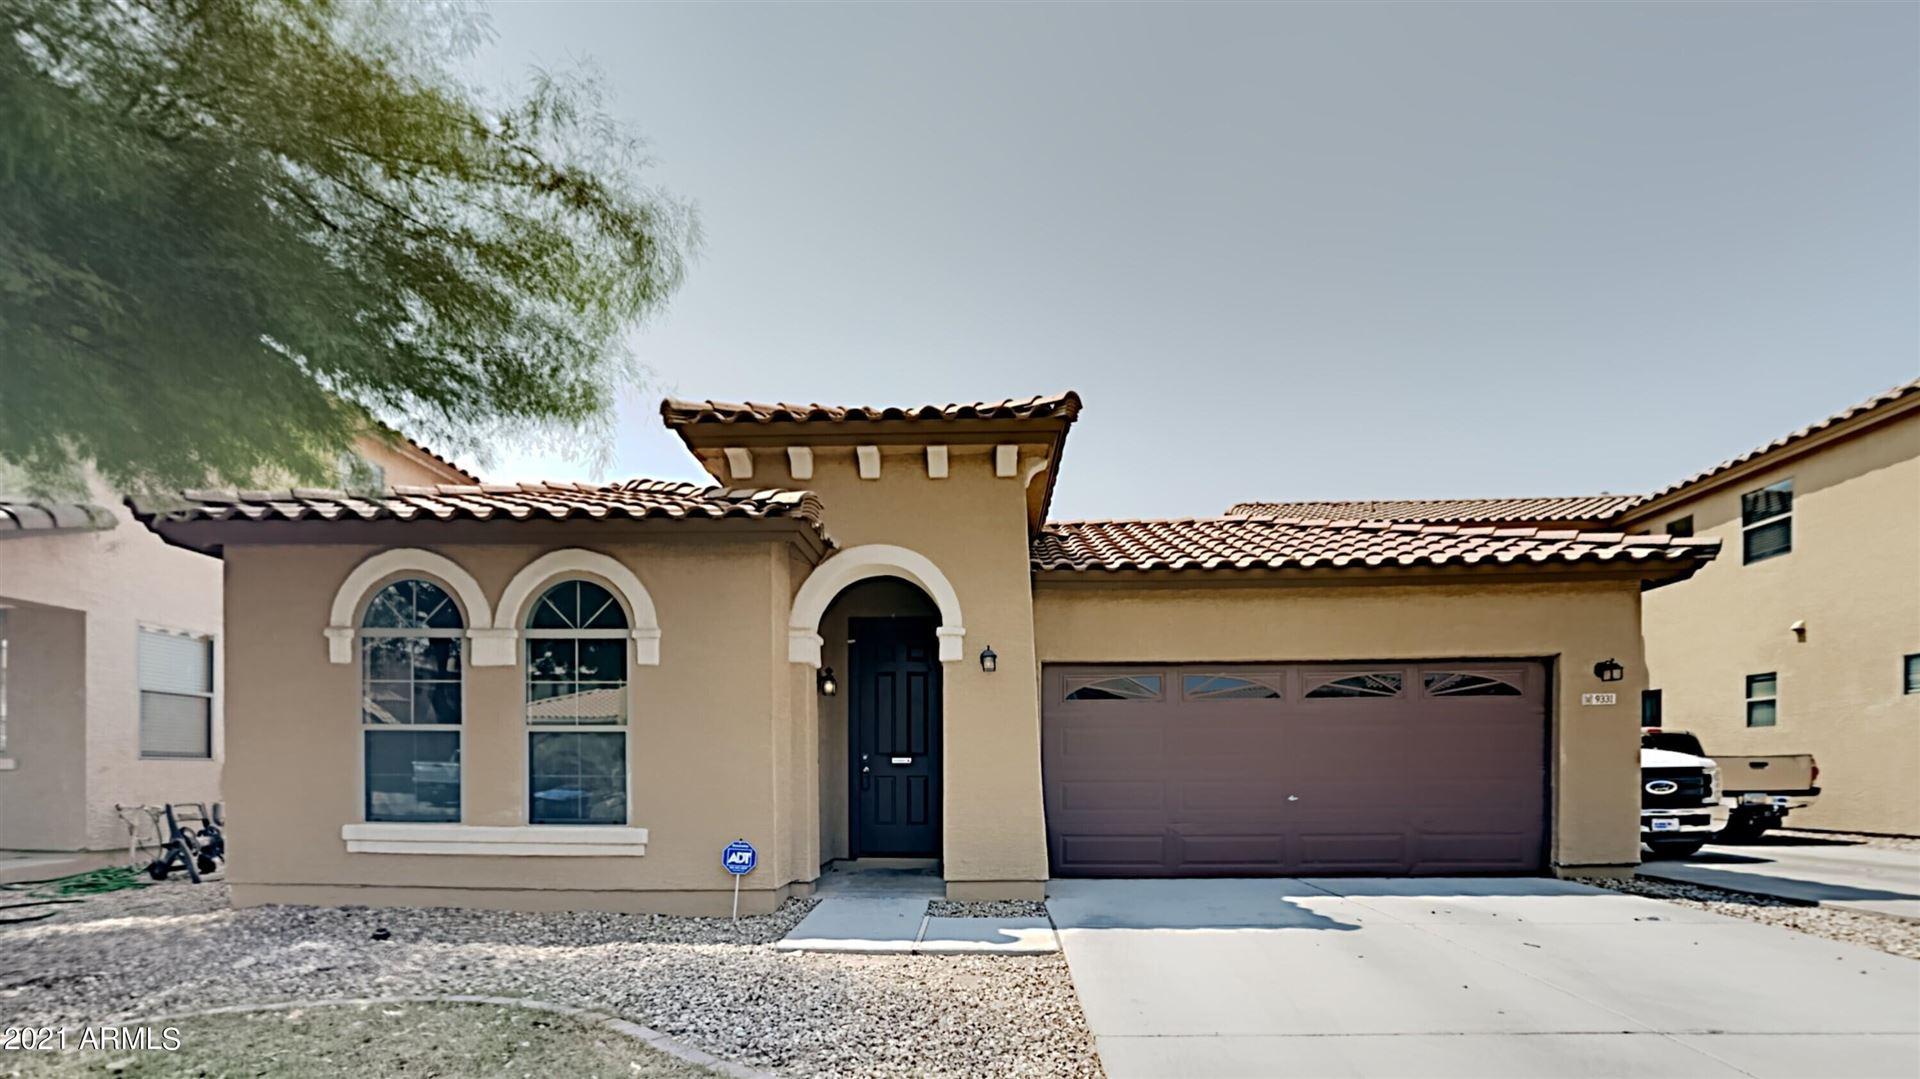 Photo of 9331 W PAYSON Road, Tolleson, AZ 85353 (MLS # 6263873)